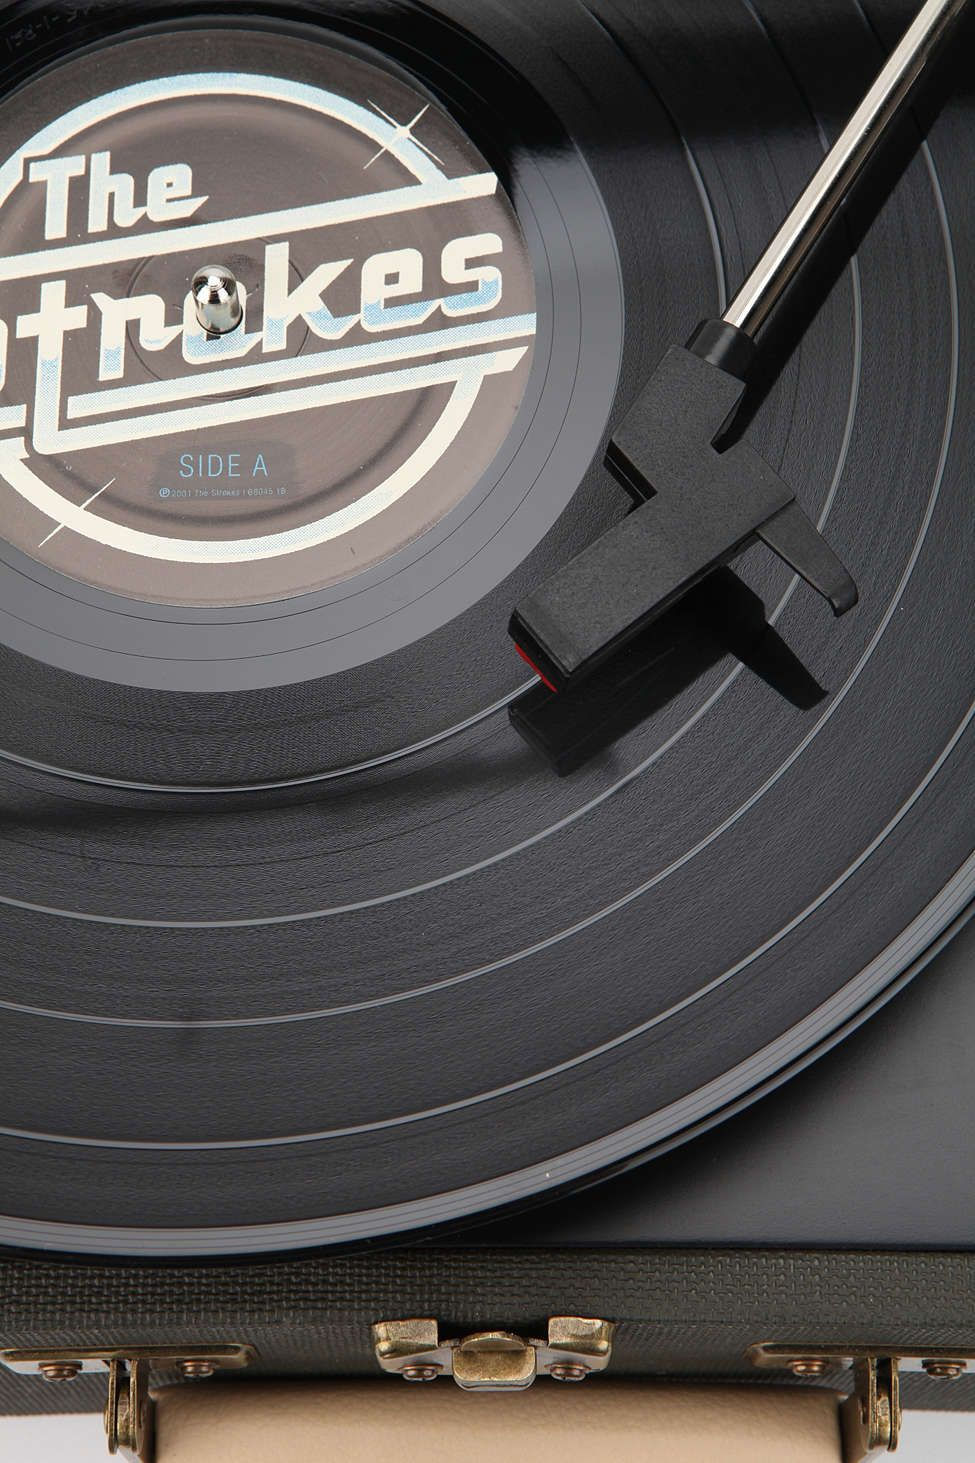 Draper Media Console Bandas Musicales Cine Musica Libros The Strokes